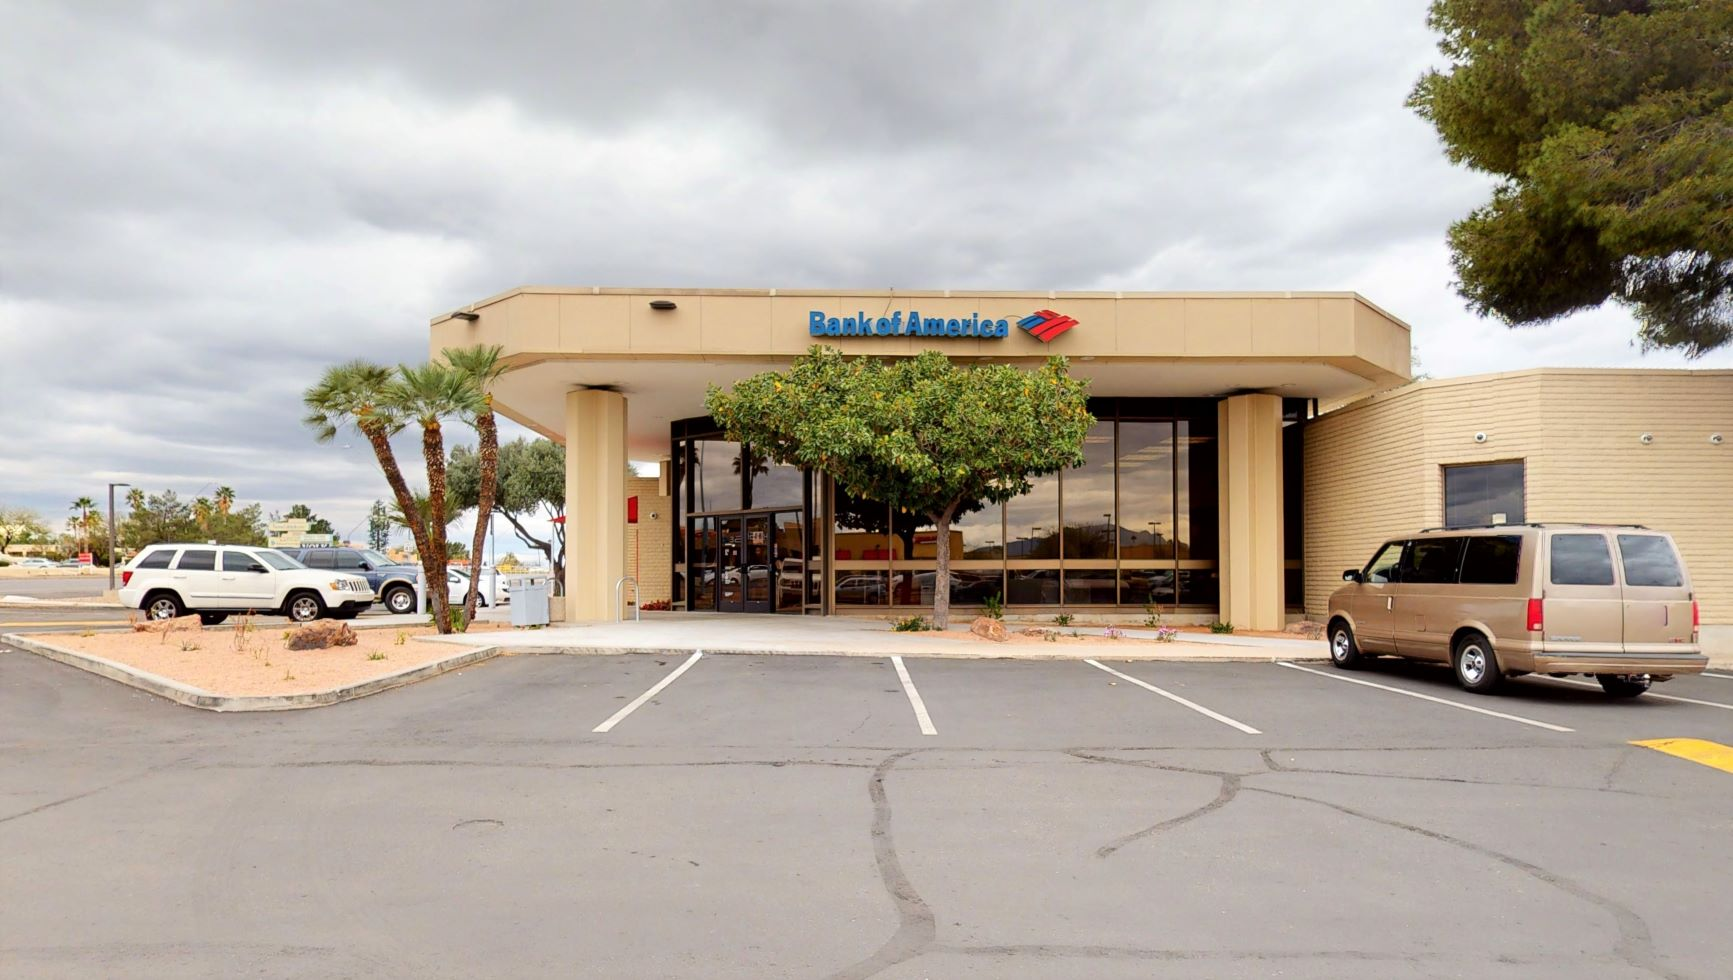 Bank of America financial center with drive-thru ATM | 7077 E Tanque Verde Rd, Tucson, AZ 85715